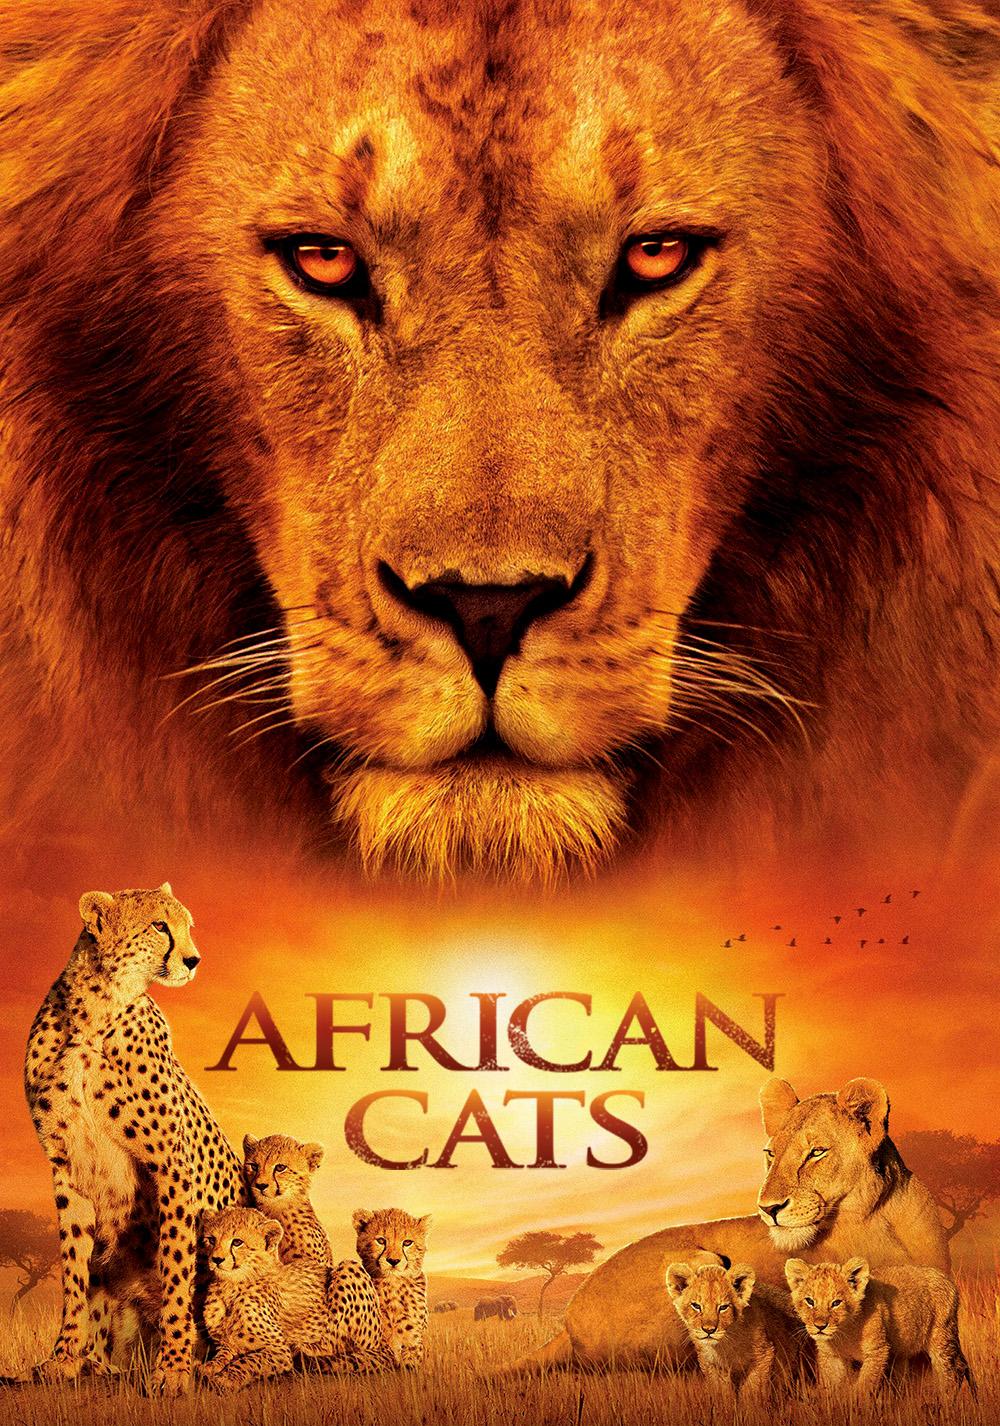 African Cats (2011) 640Kbps 23Fps DD 6Ch TR Blu-ray Audio SHS